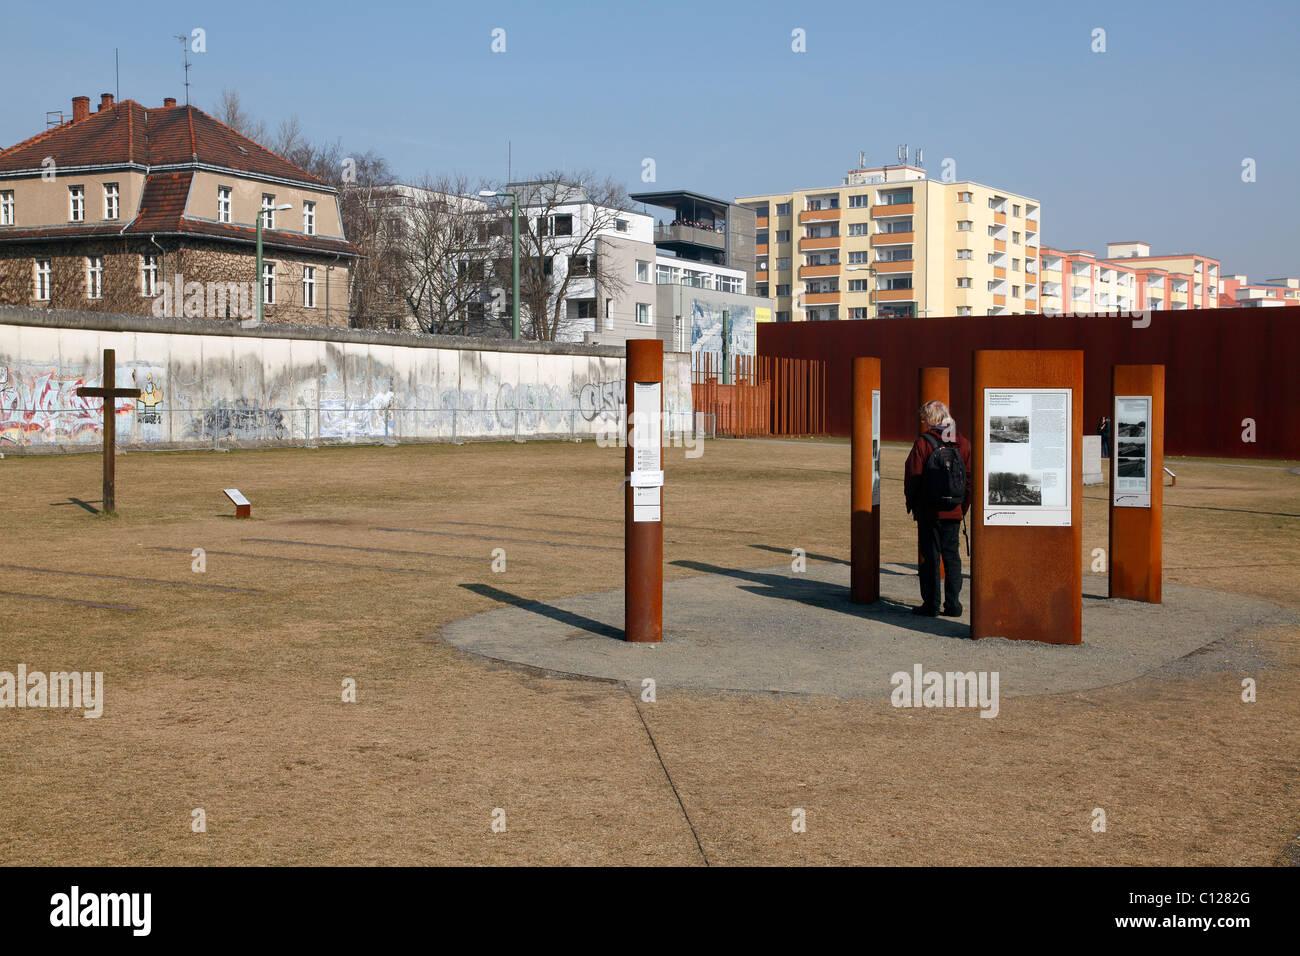 Information boards at Berlin Wall Memorial Visitor Centre, Berlin, Germany - Stock Image